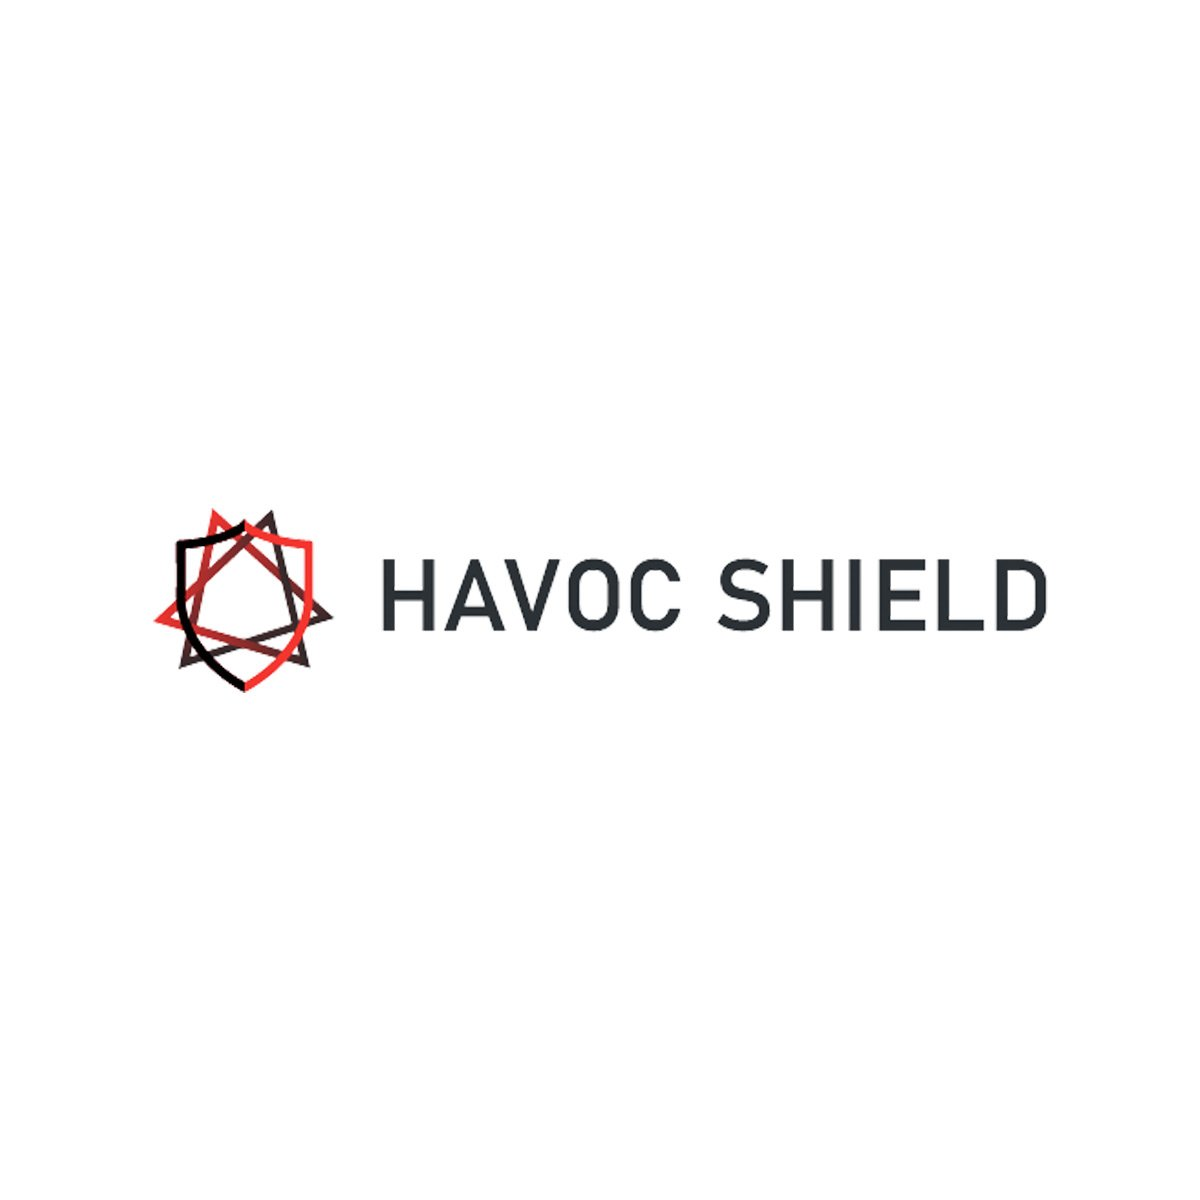 Havoc Shield